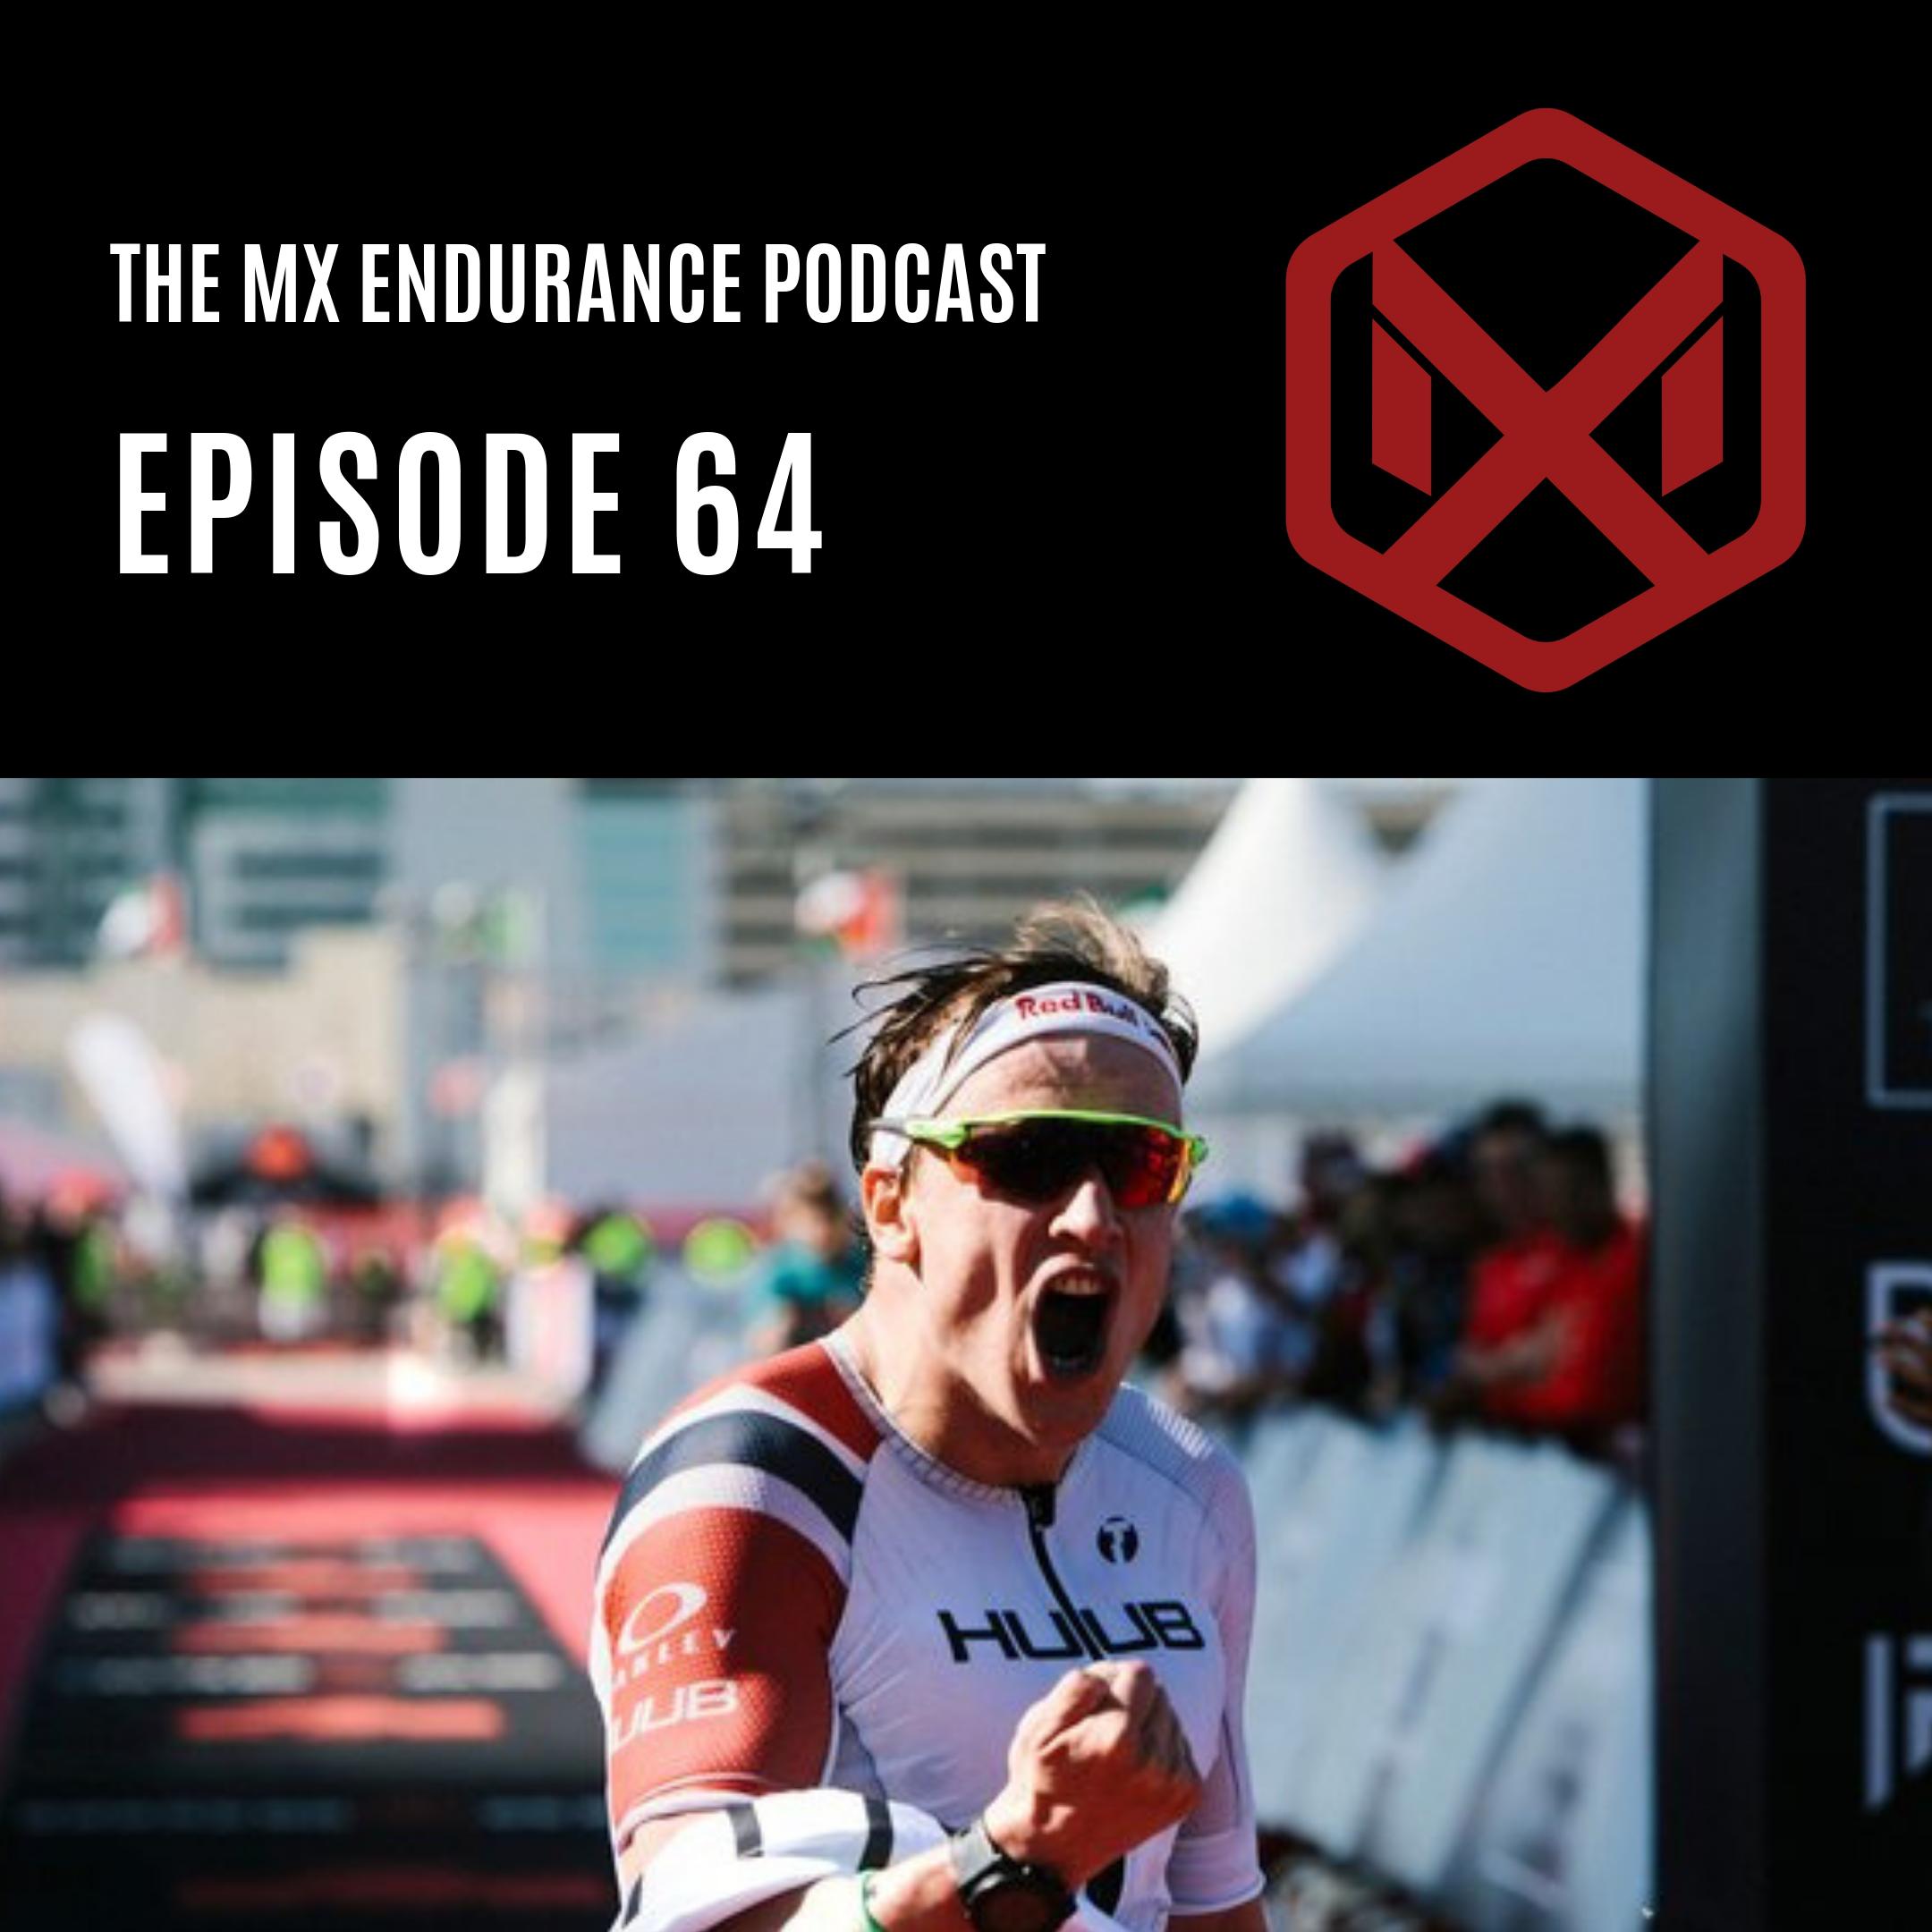 #64 - The World's Fastest 70.3 Athlete - Kristian Blummenfelt